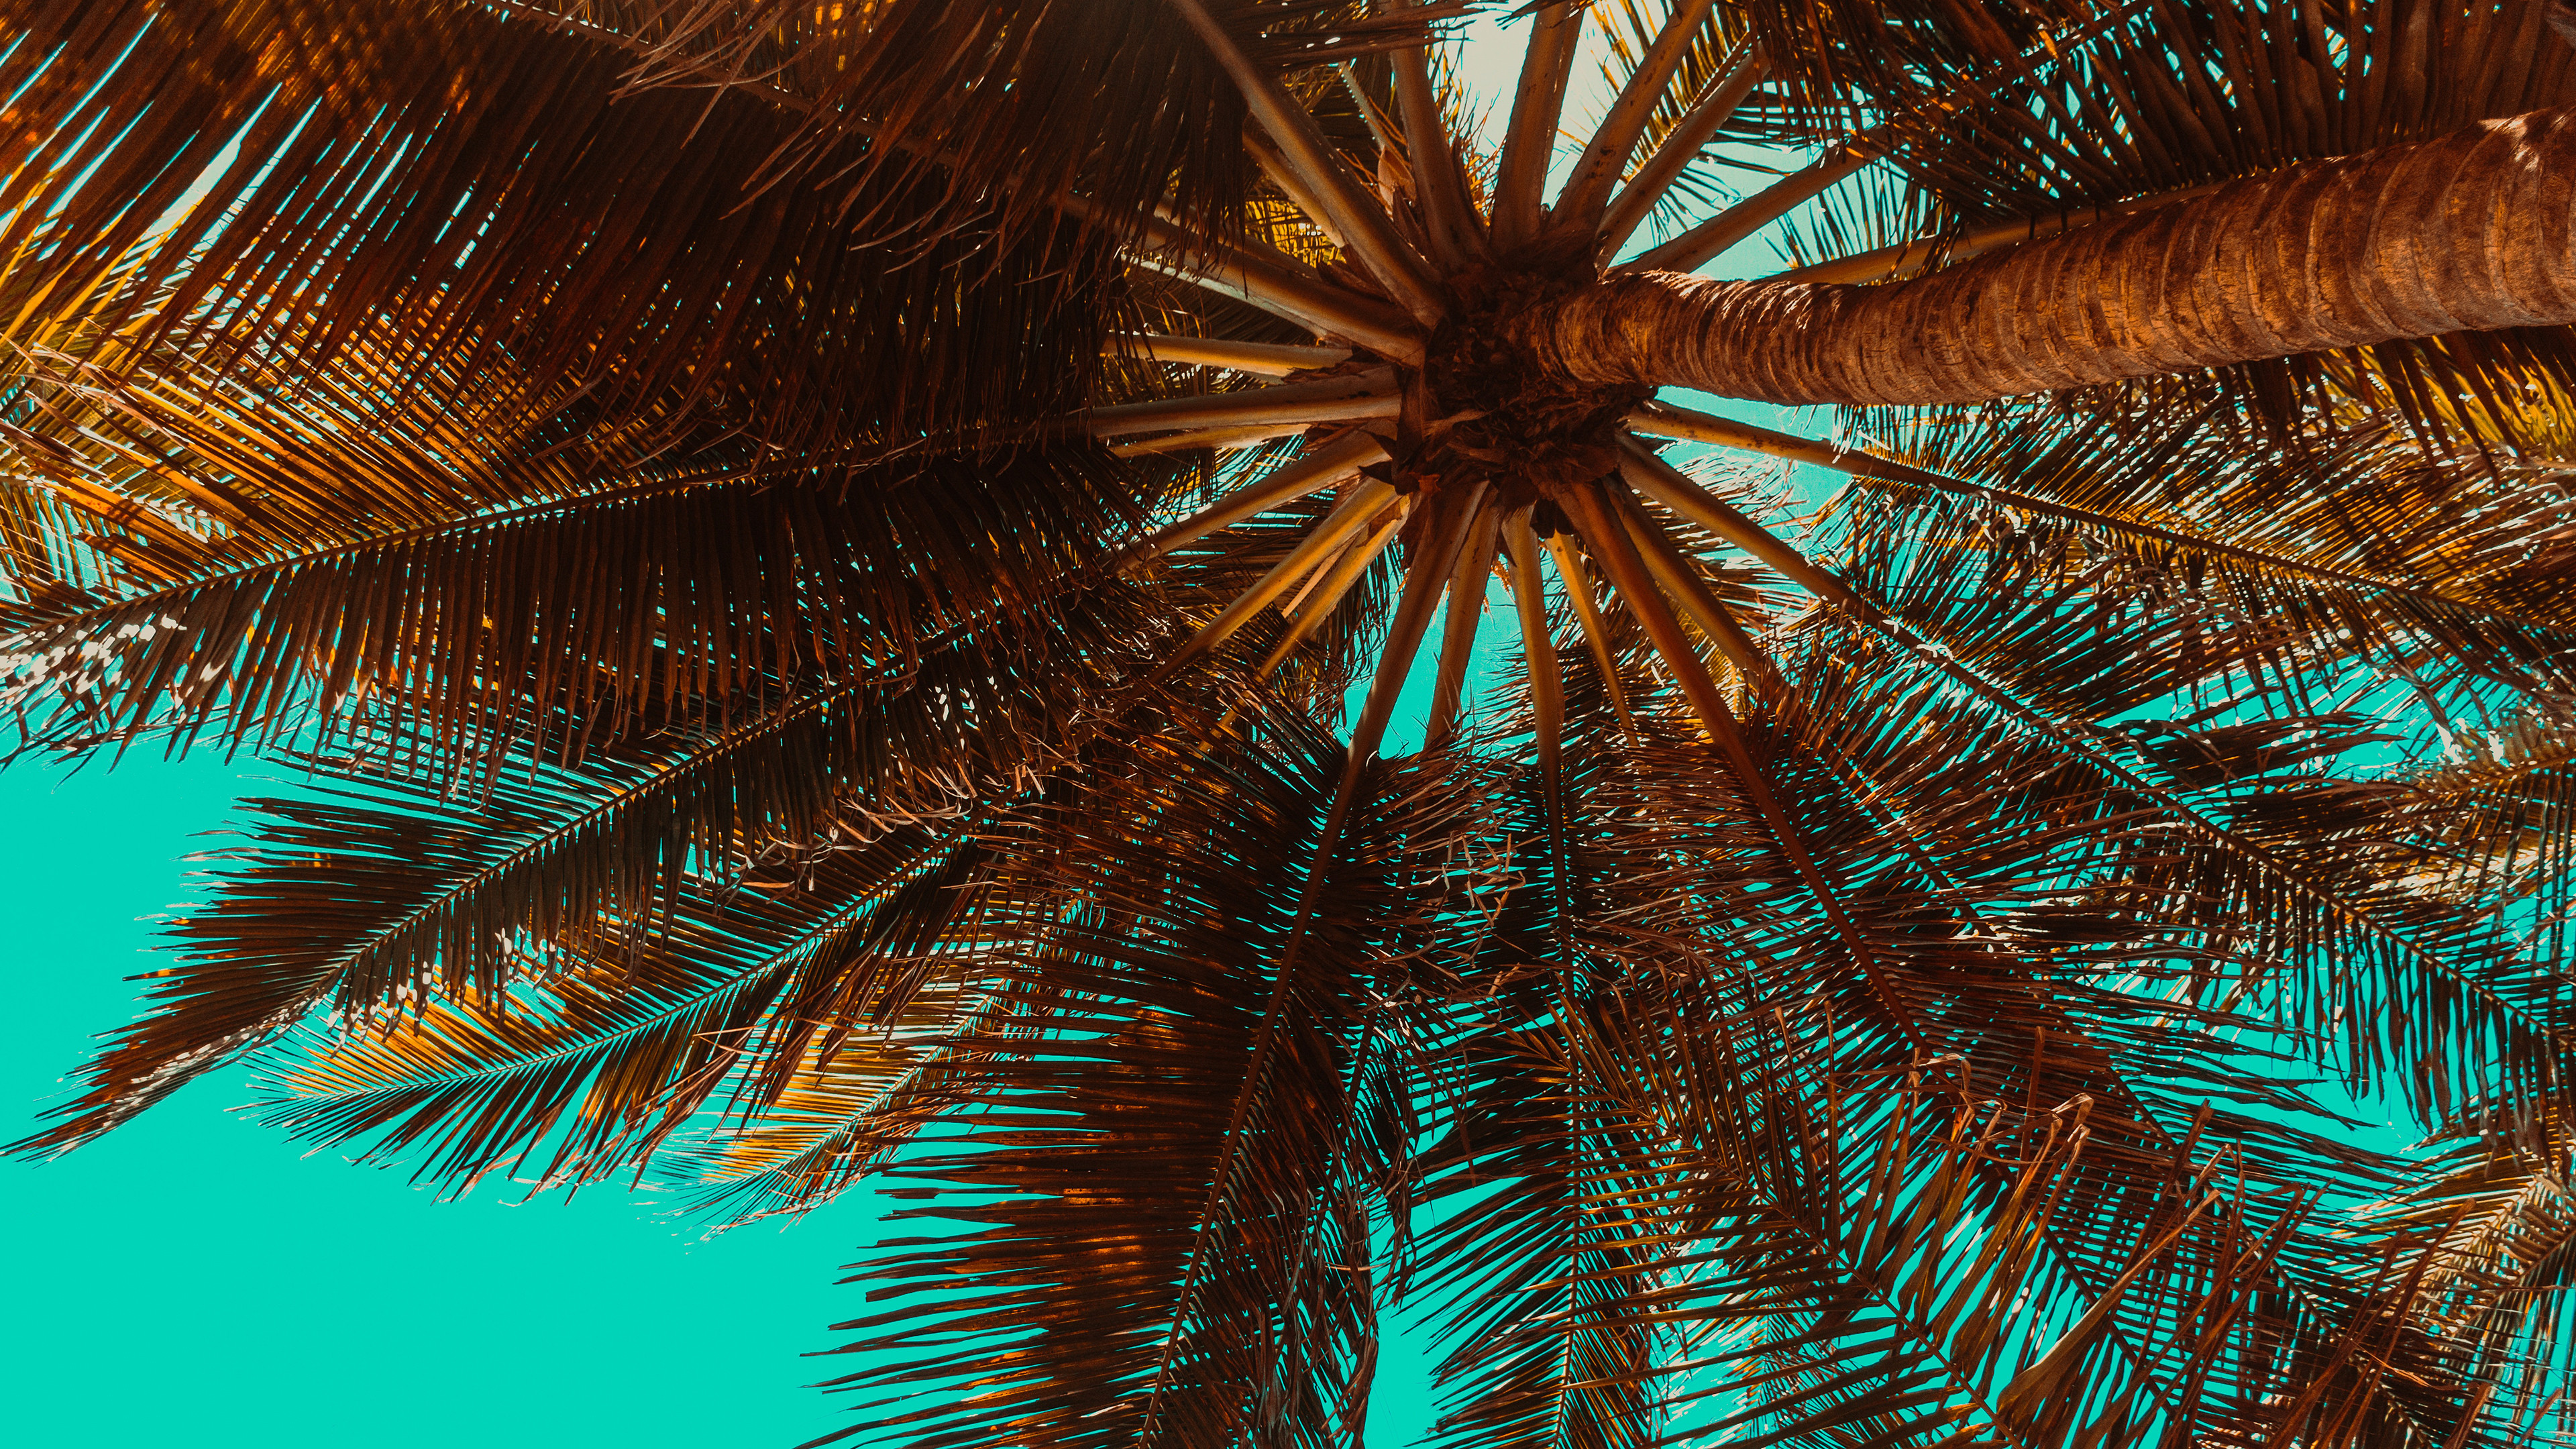 Palm Tree Desktop Wallpaper (72+ images)